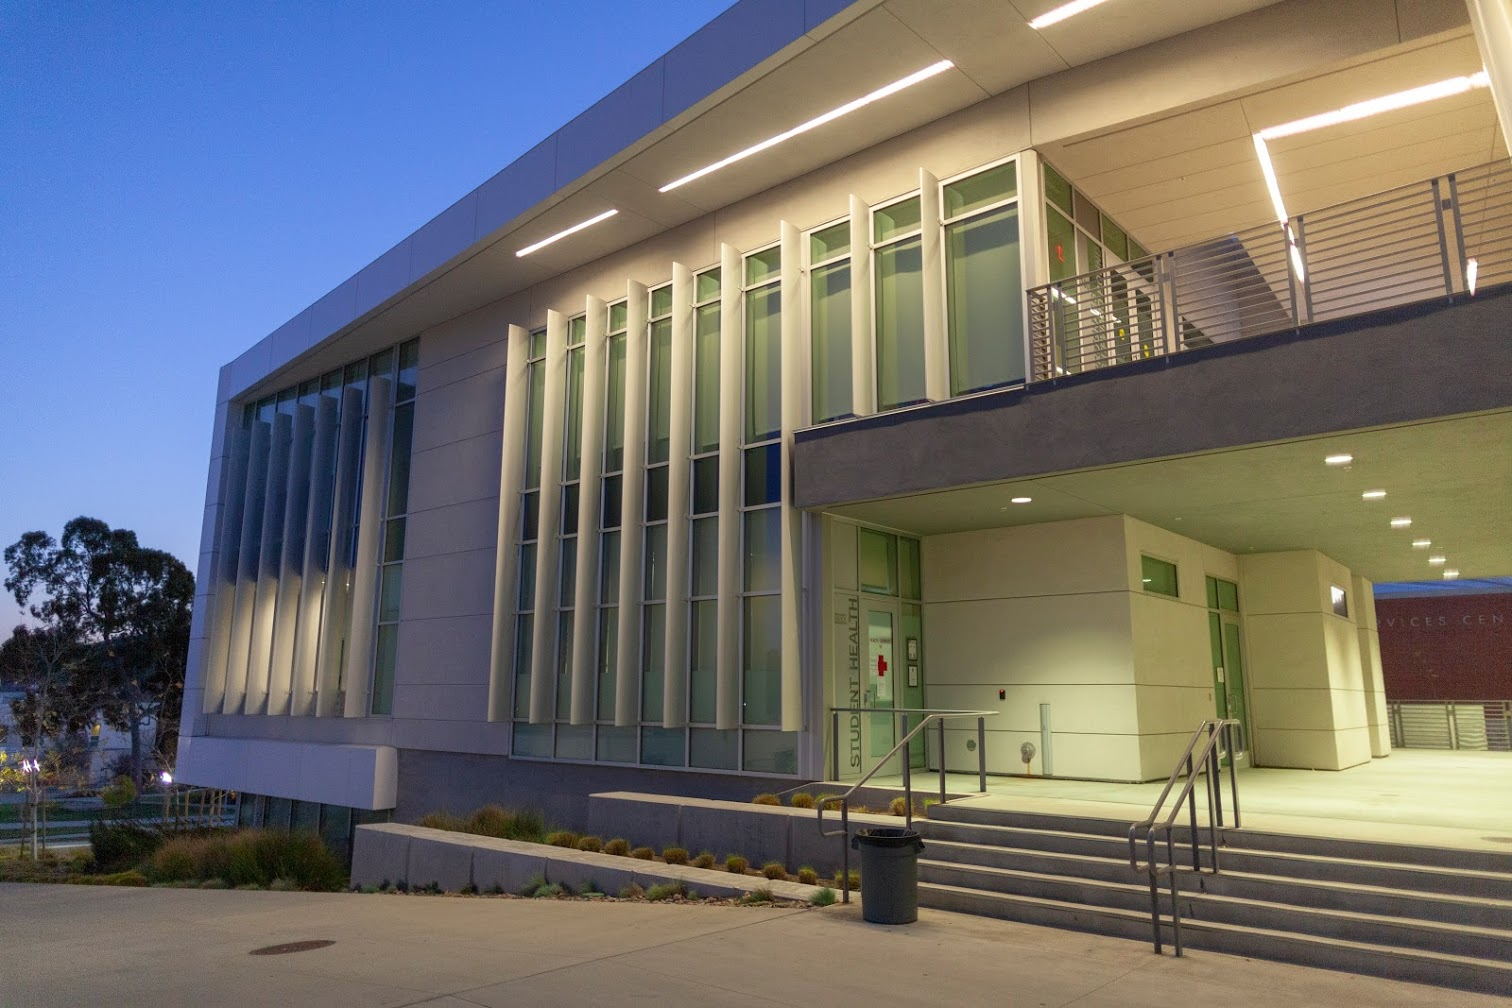 125776_2019-03-15-Campus-Photos-jg_040.jpg